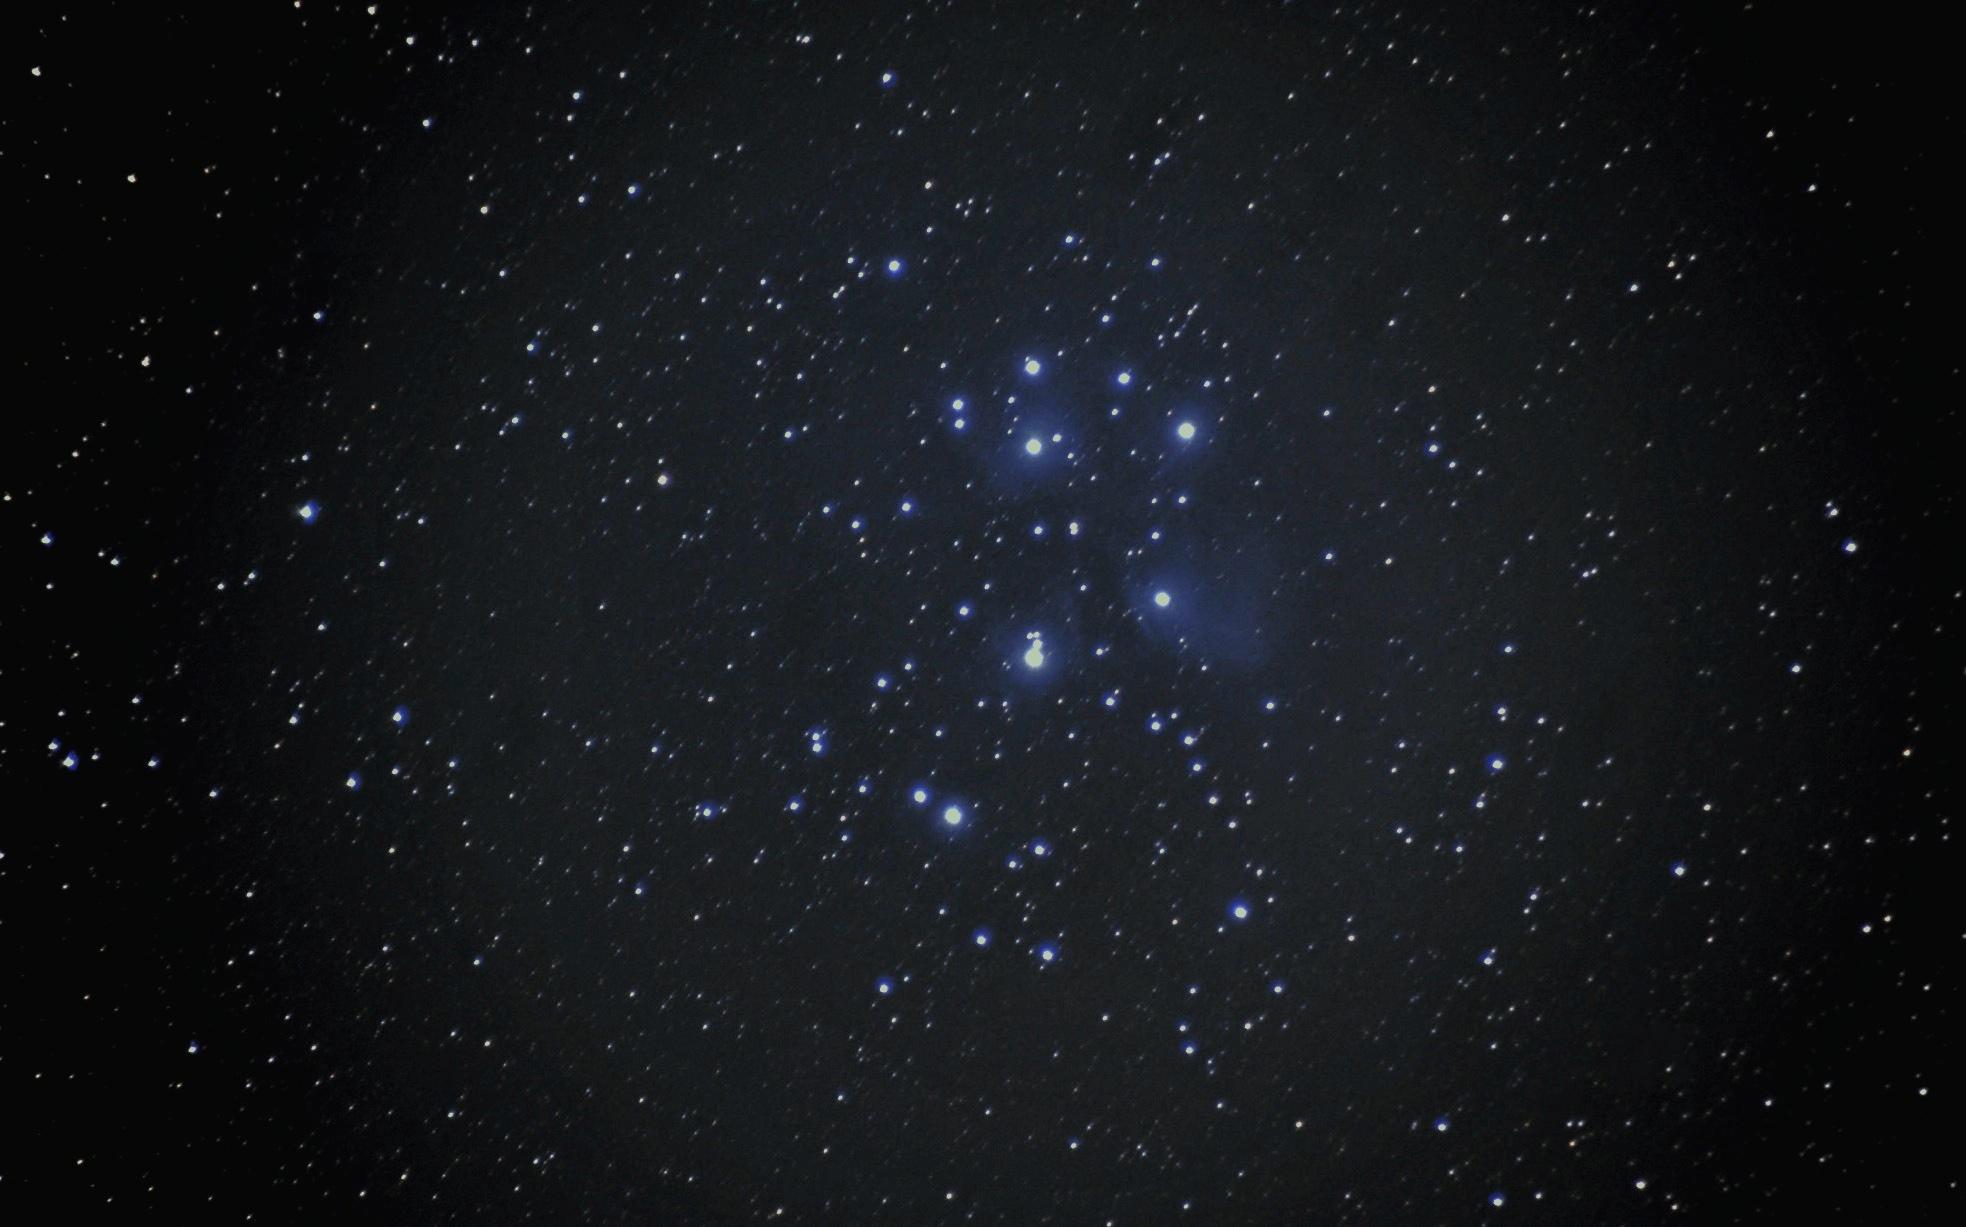 M45def.jpg.af1d1e84ed51e3264f1c901a785c34a5.jpg